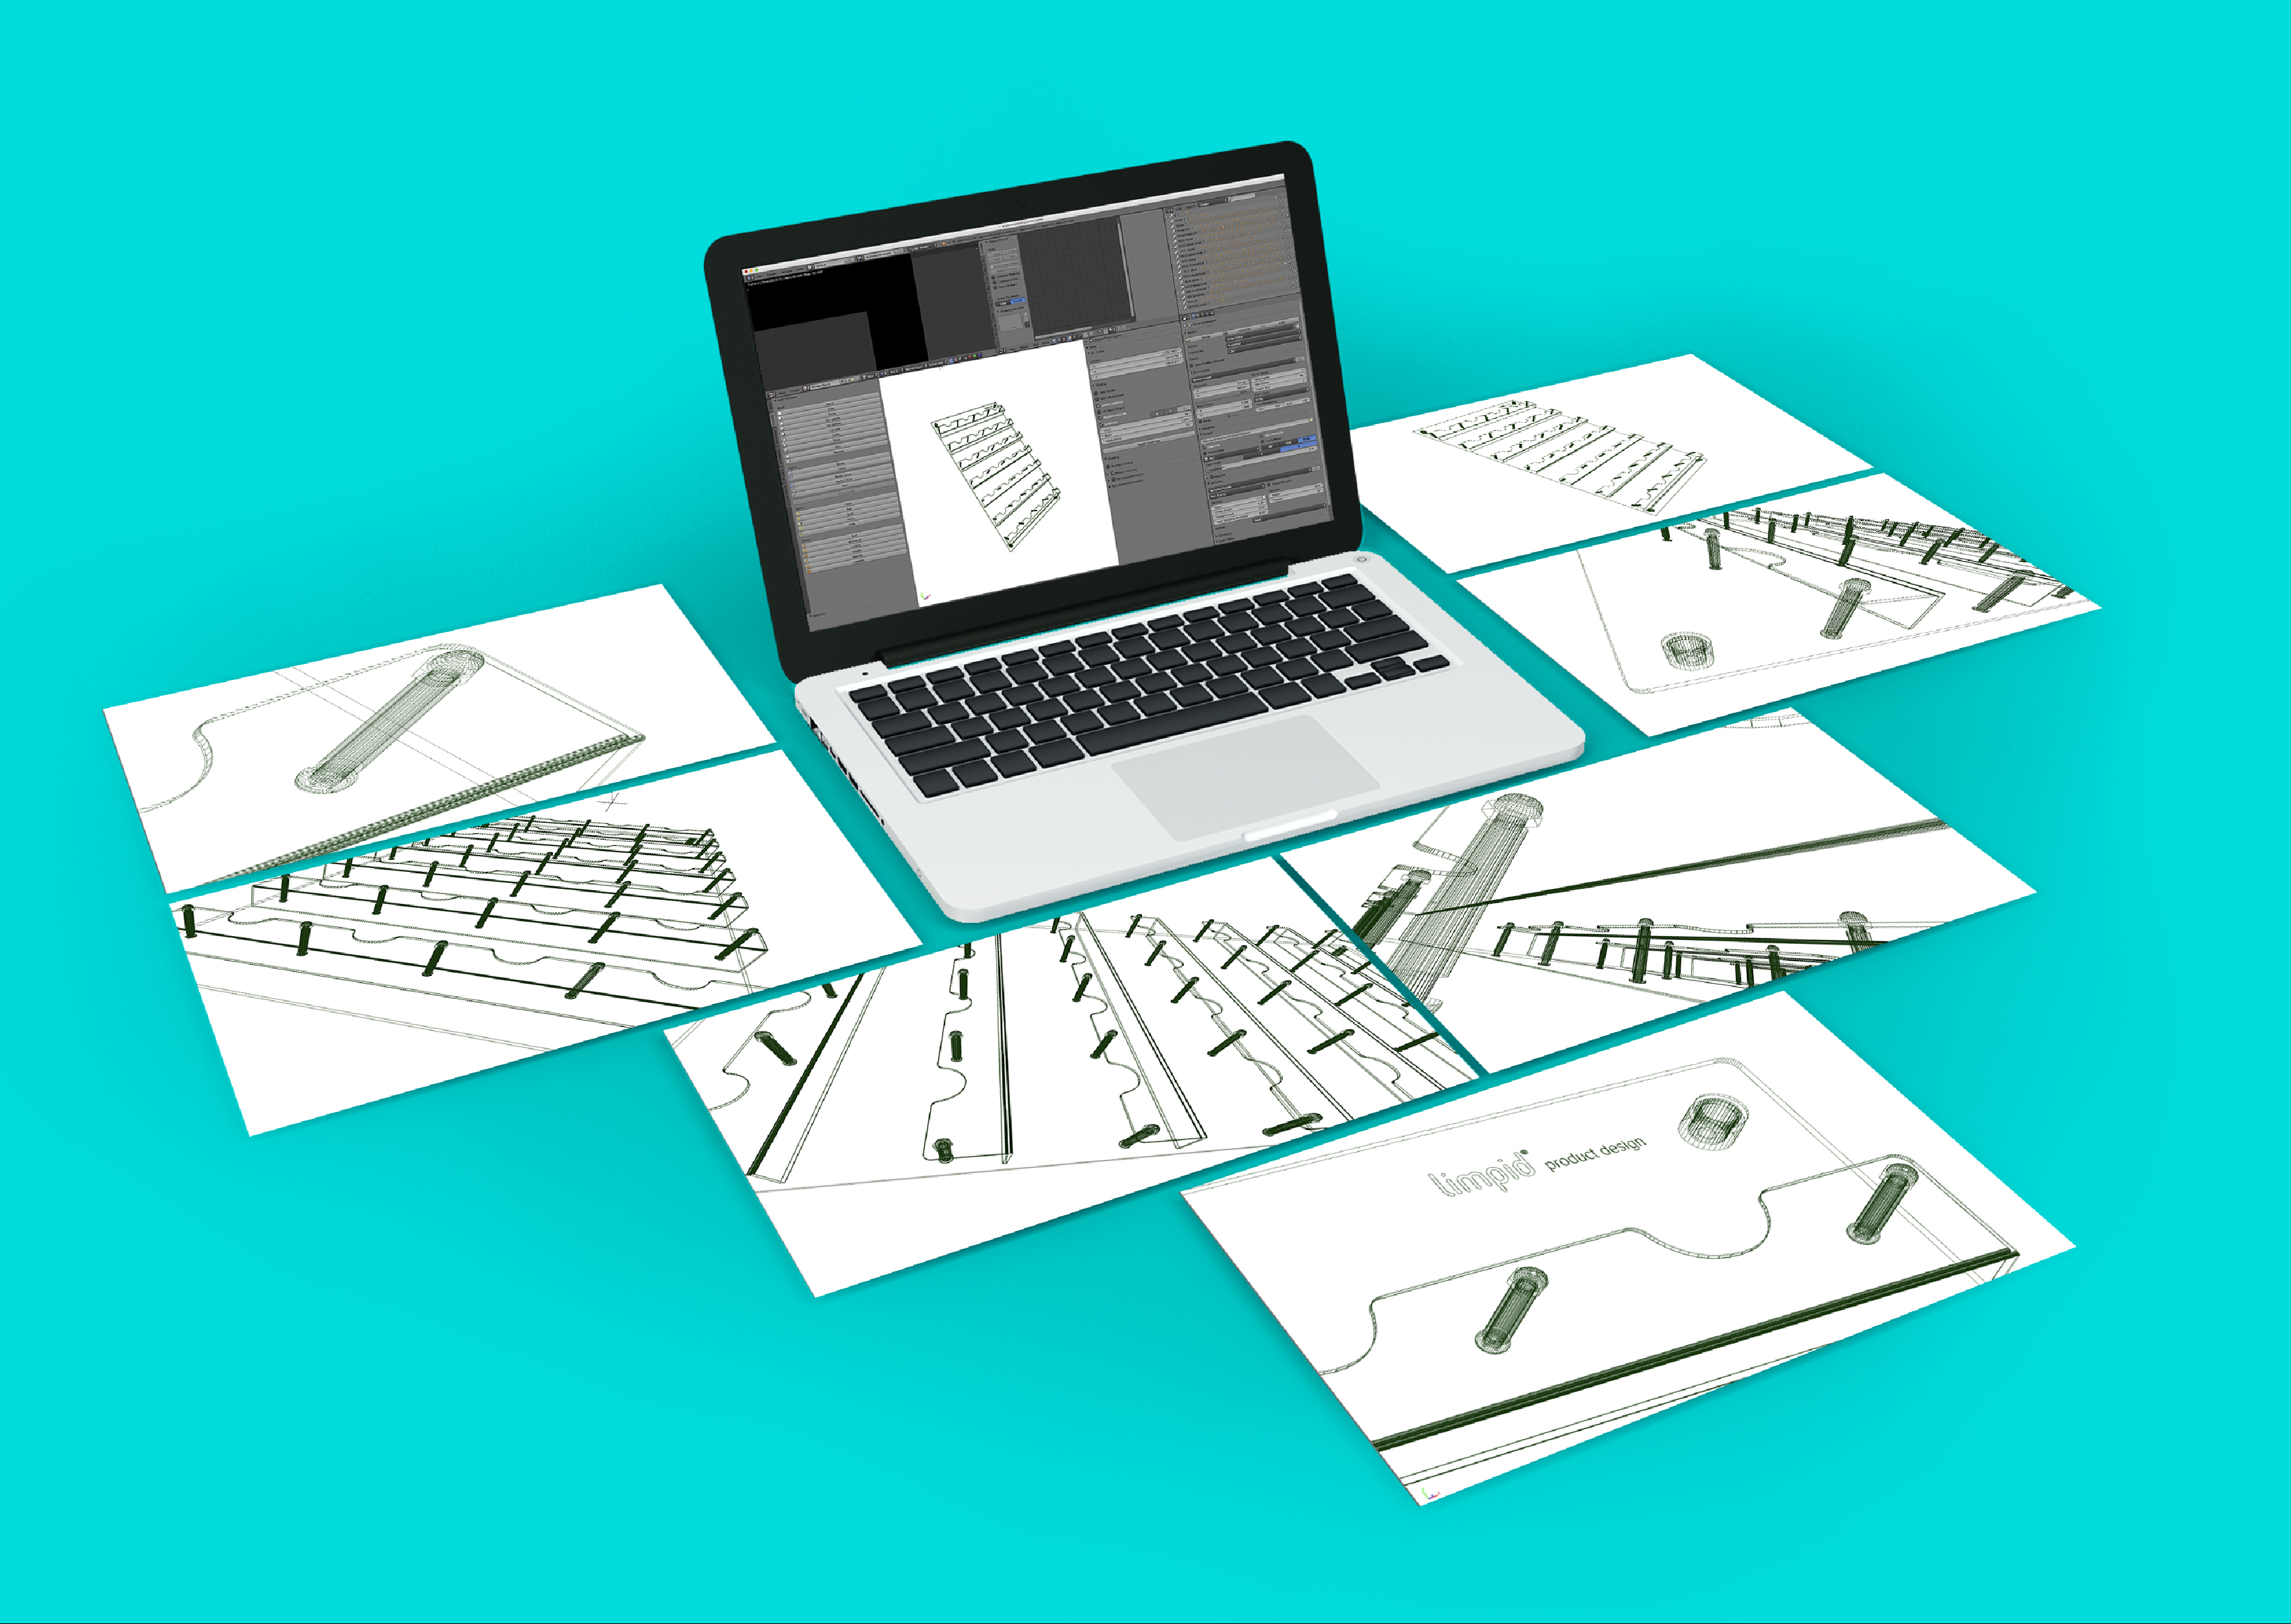 limpid productdesign website hannemann media ag seite 03